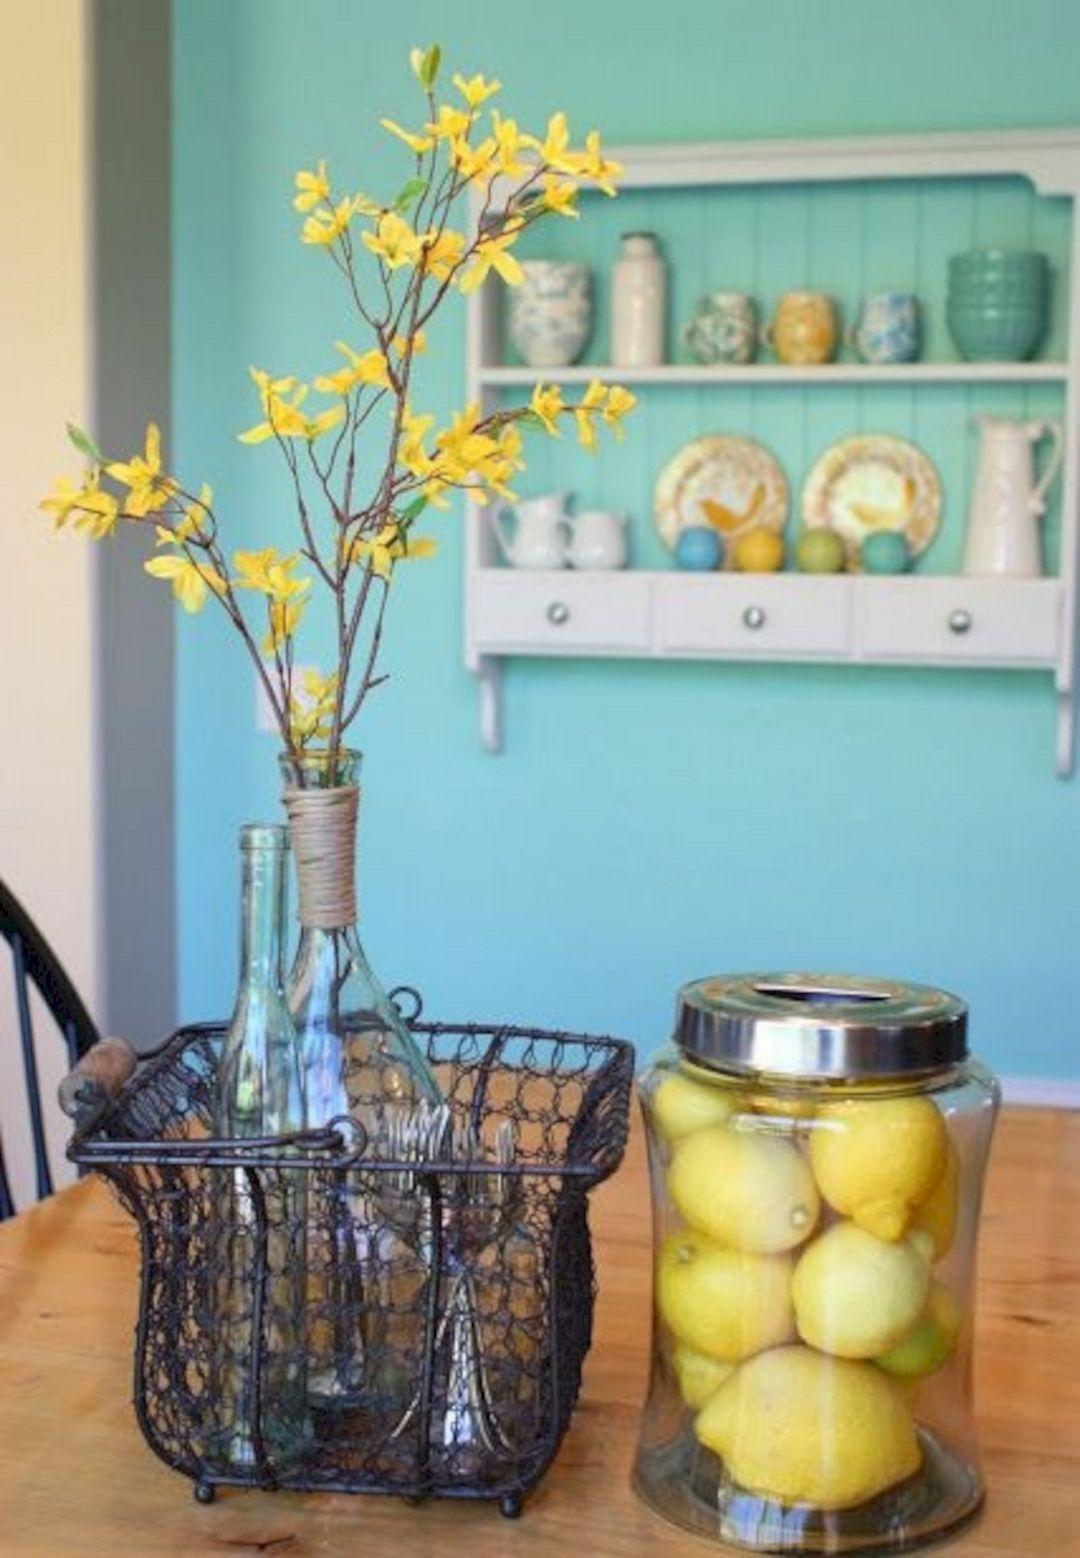 Spring Home Decor Ideas Part - 48: Spring Kitchen Decorating Ideas